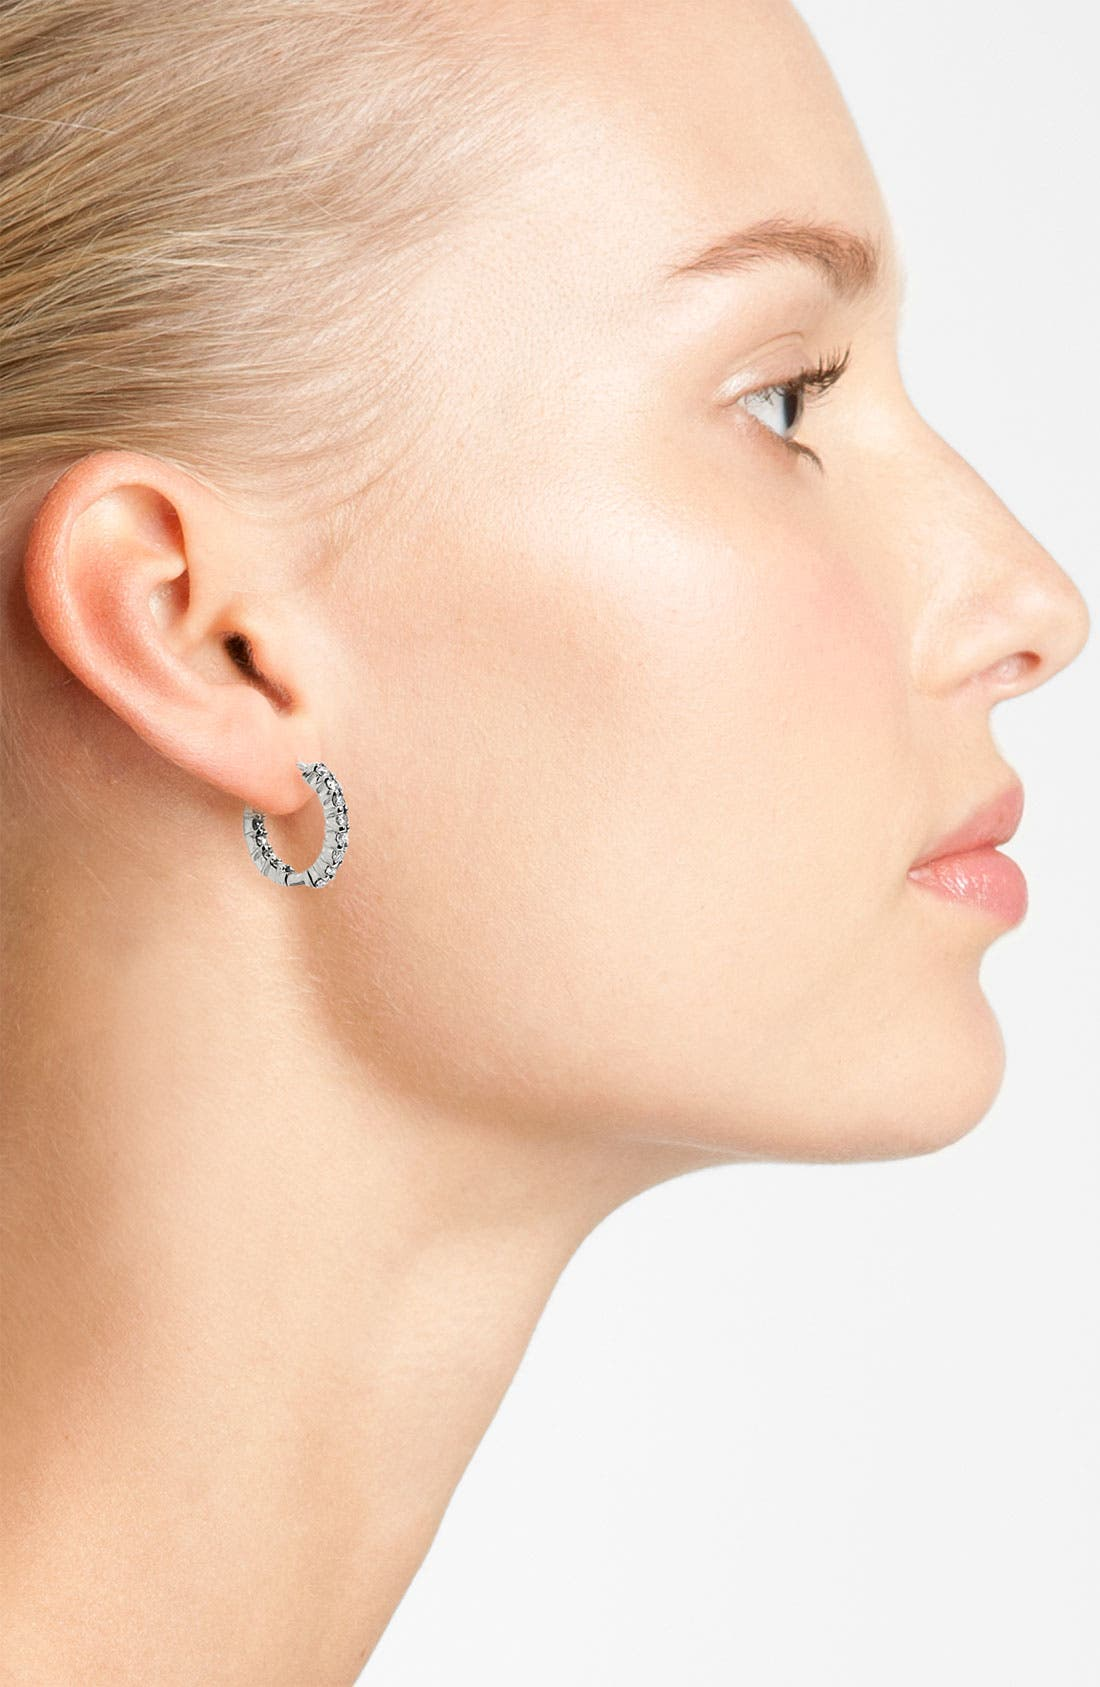 12mm Small Diamond Hoop Earrings,                             Alternate thumbnail 2, color,